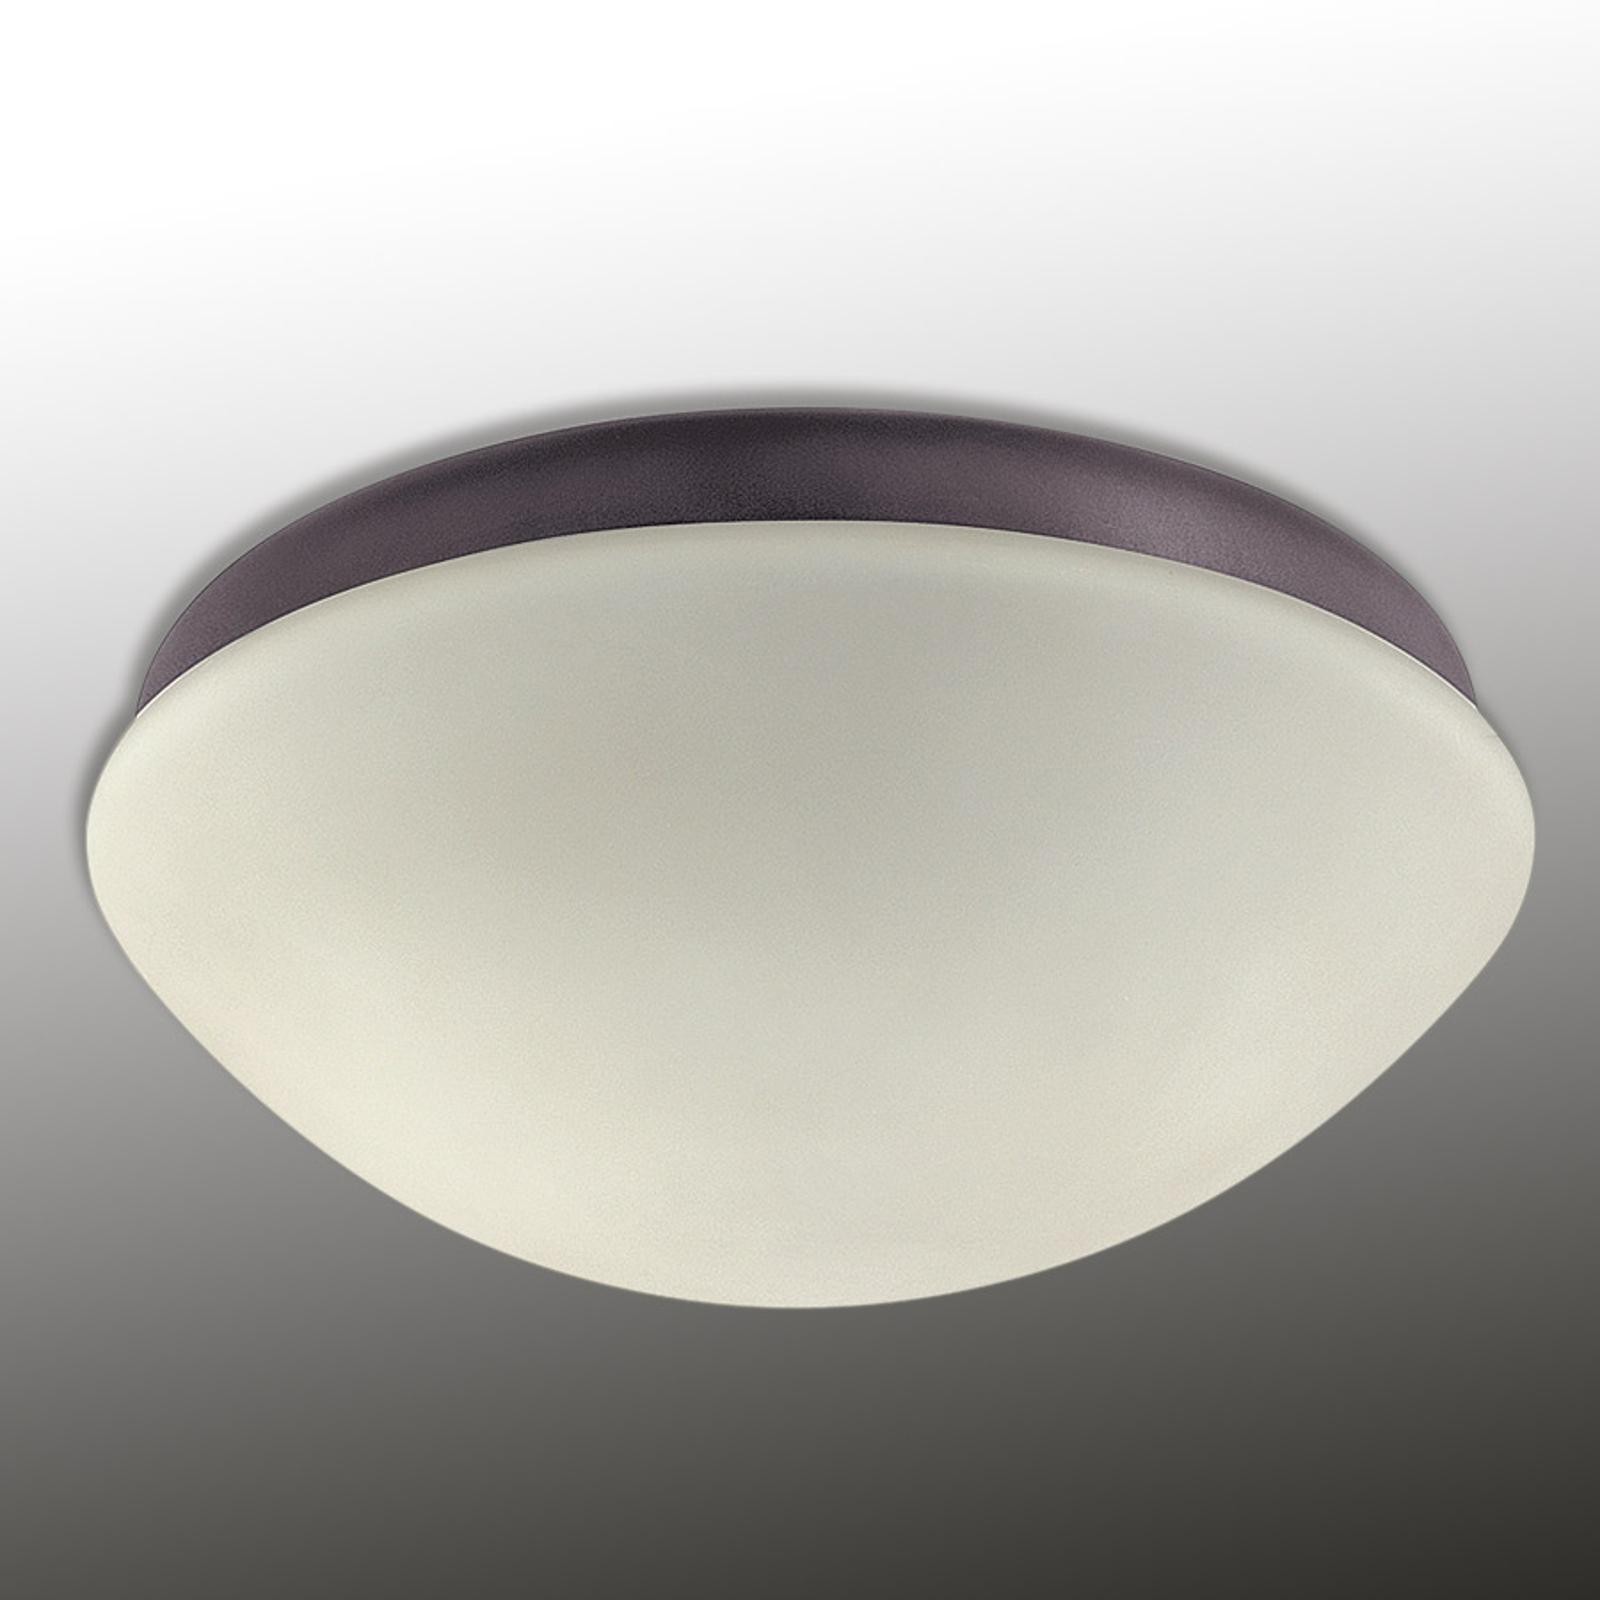 Lampa do wentylatora sufitowego OUTDOOR ELEMENTS